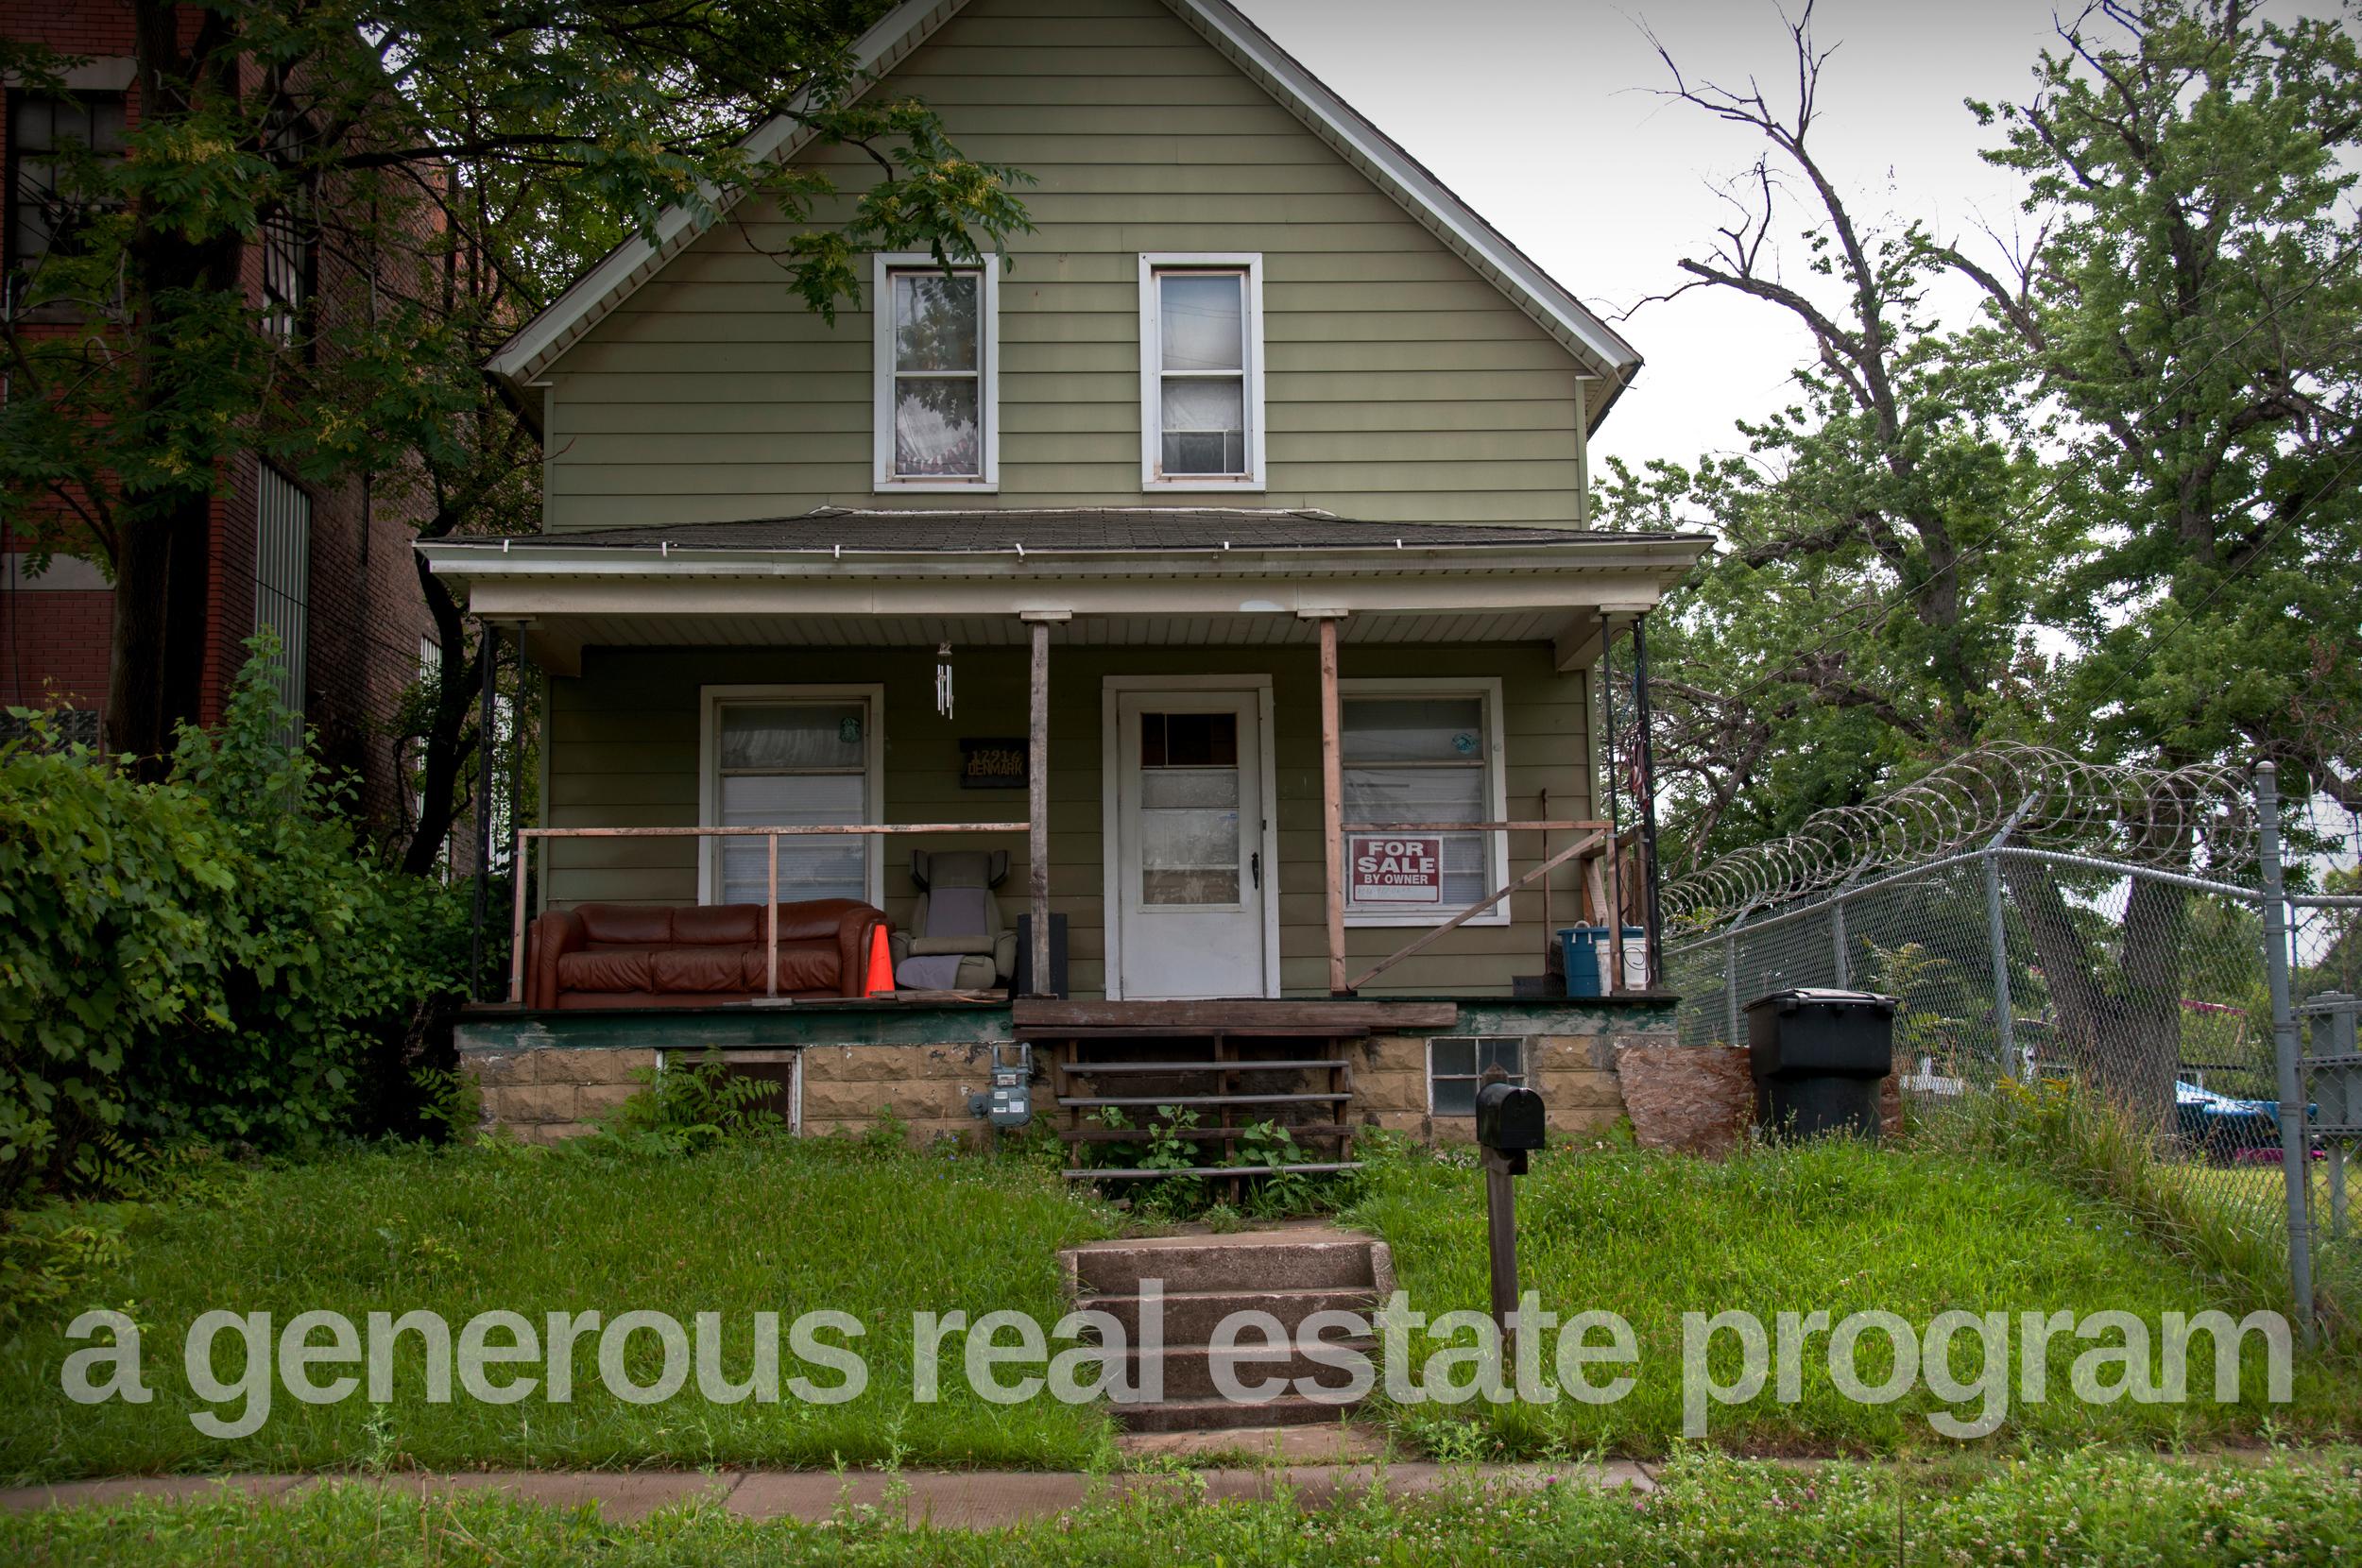 46-FSBO-generous+real+estate+p-3578947146-O.jpg